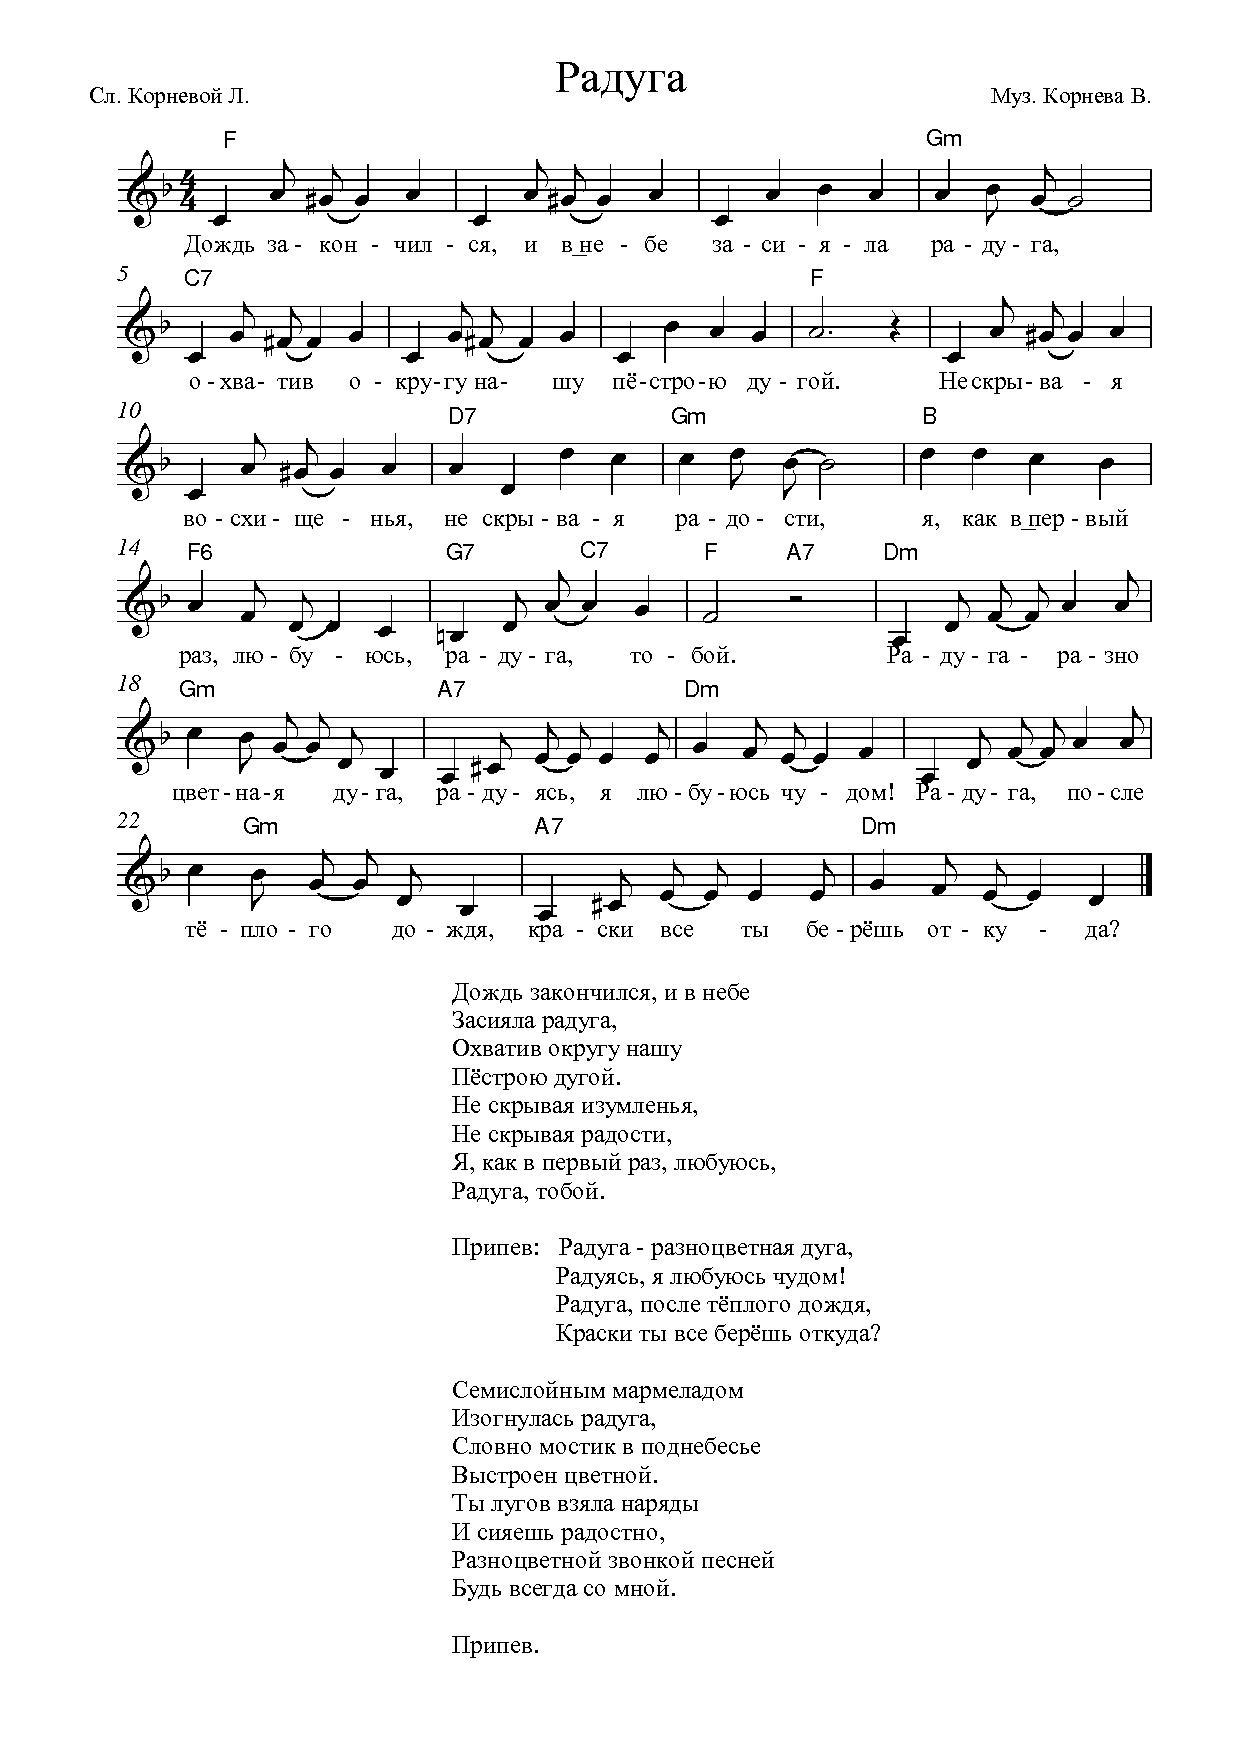 Музыка виктора анатольевича корнева